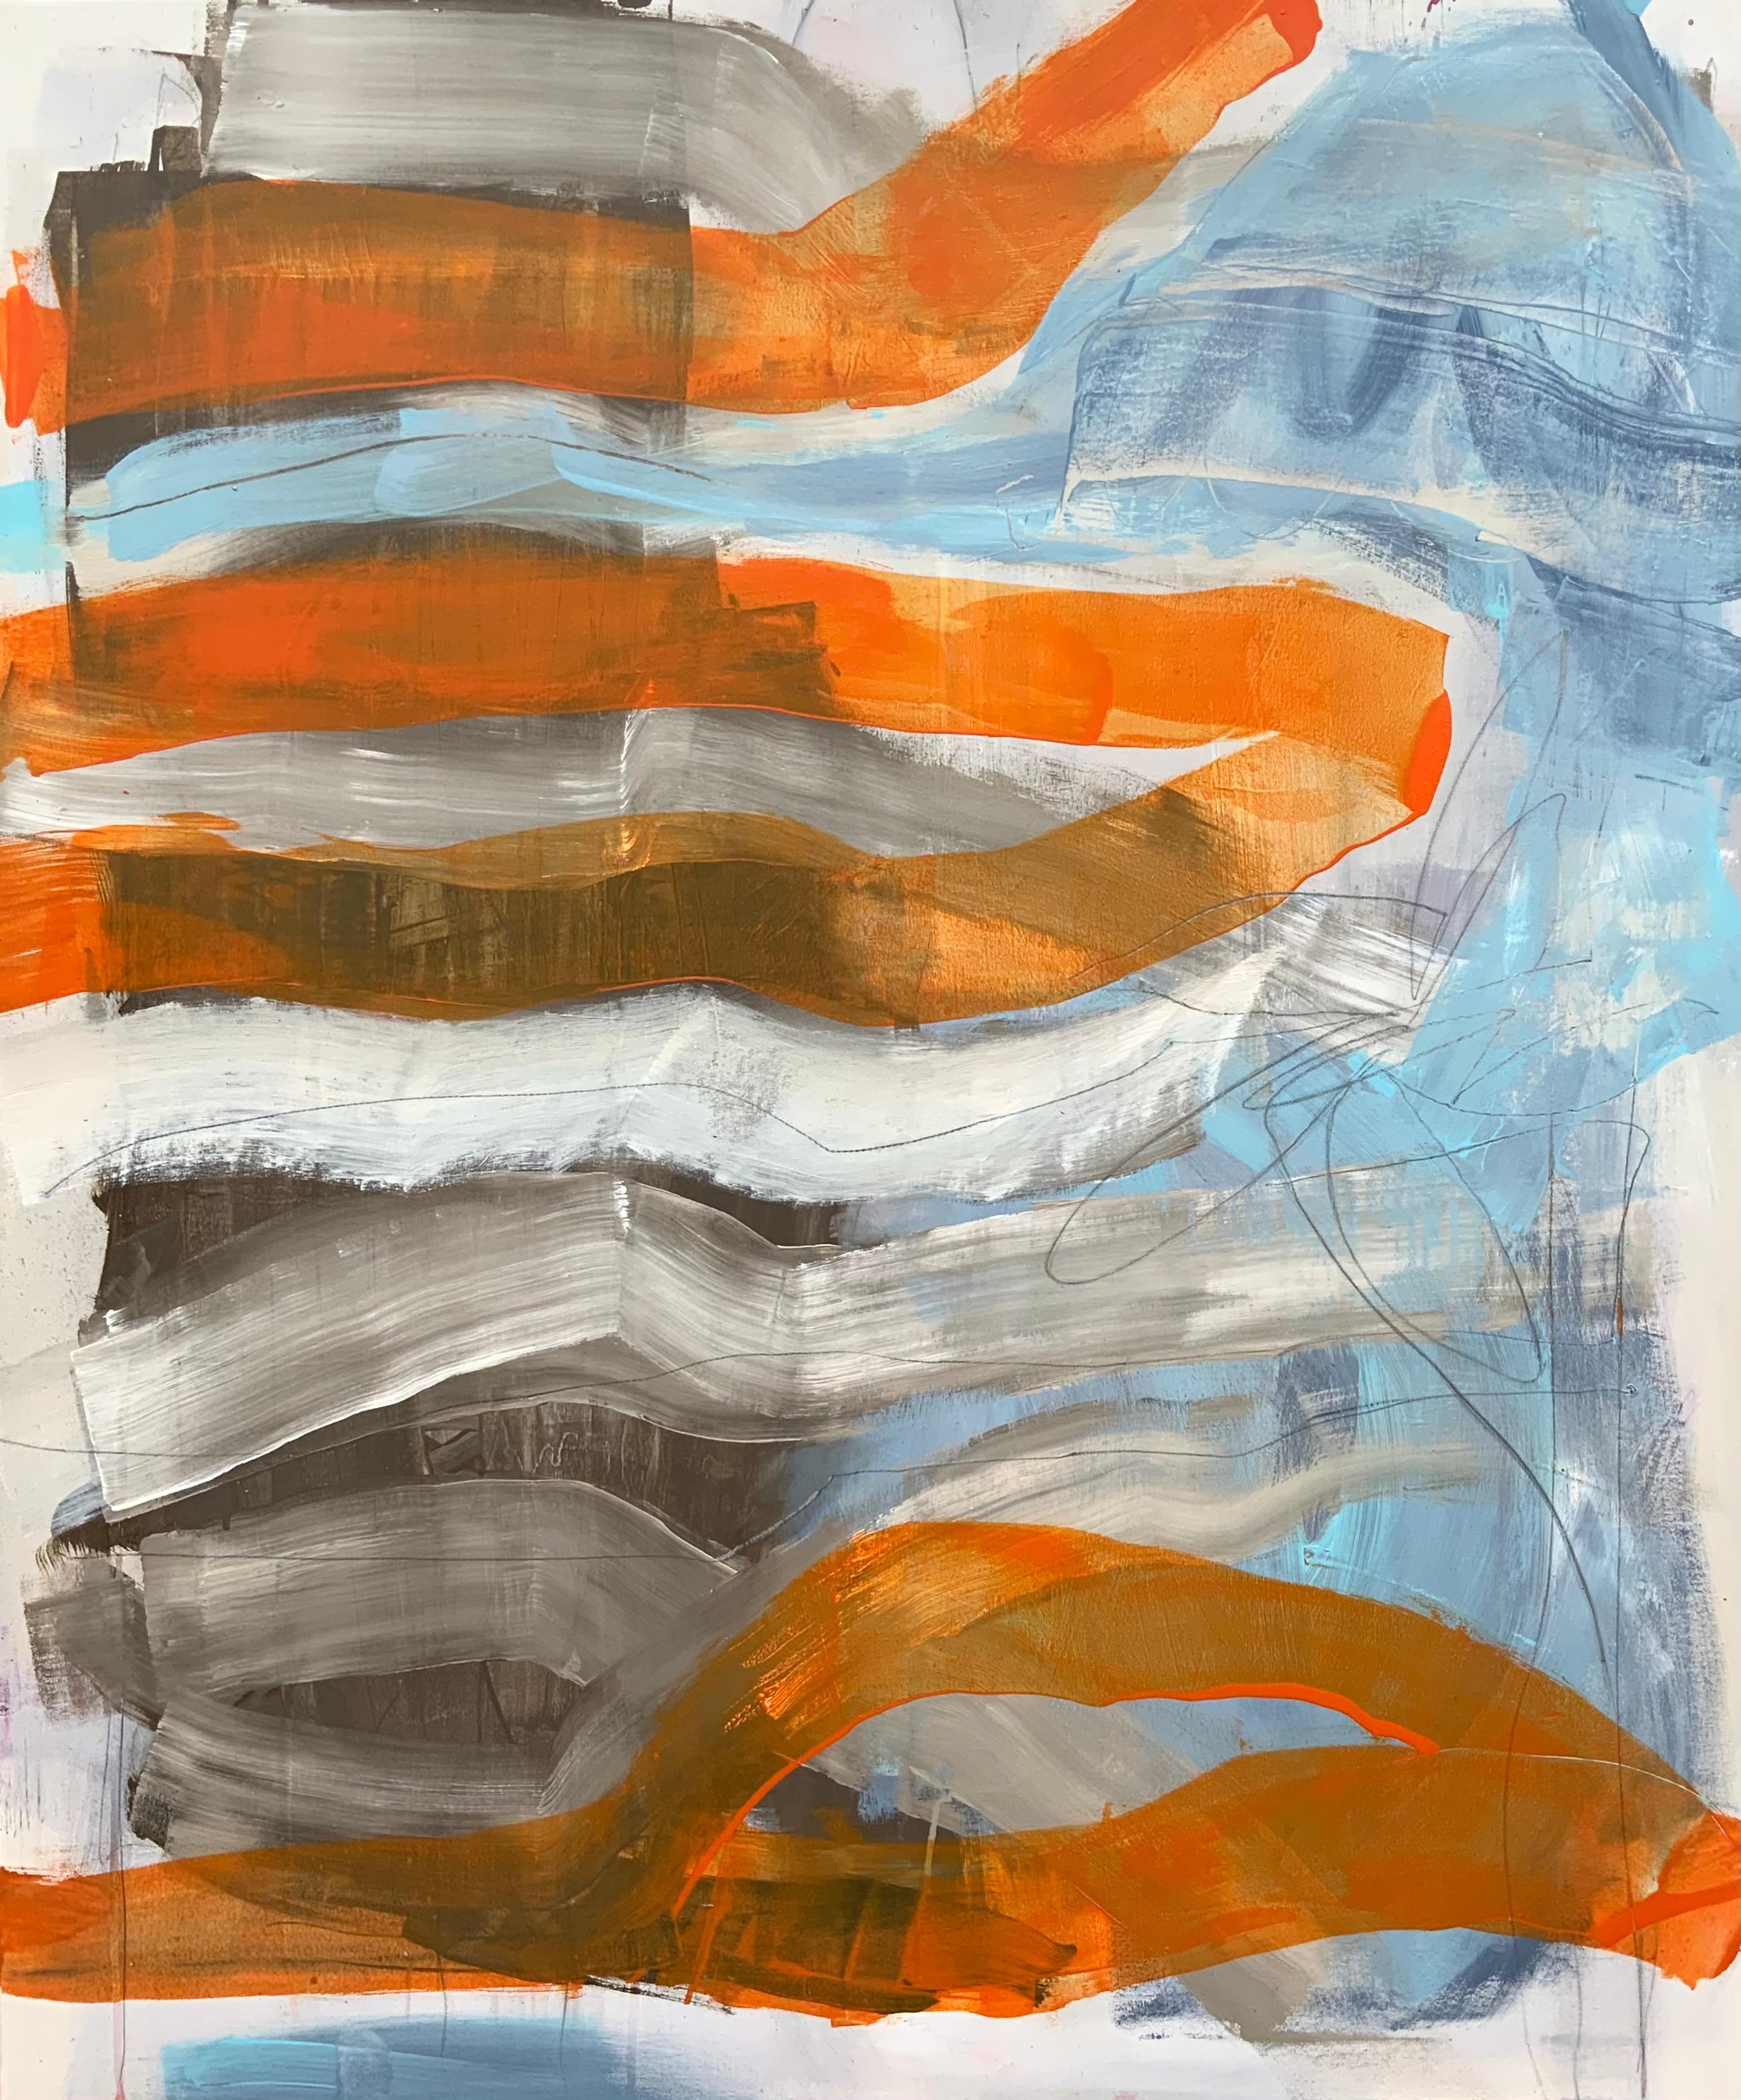 artwork On the Fifth Floor by Susanne Kirsch